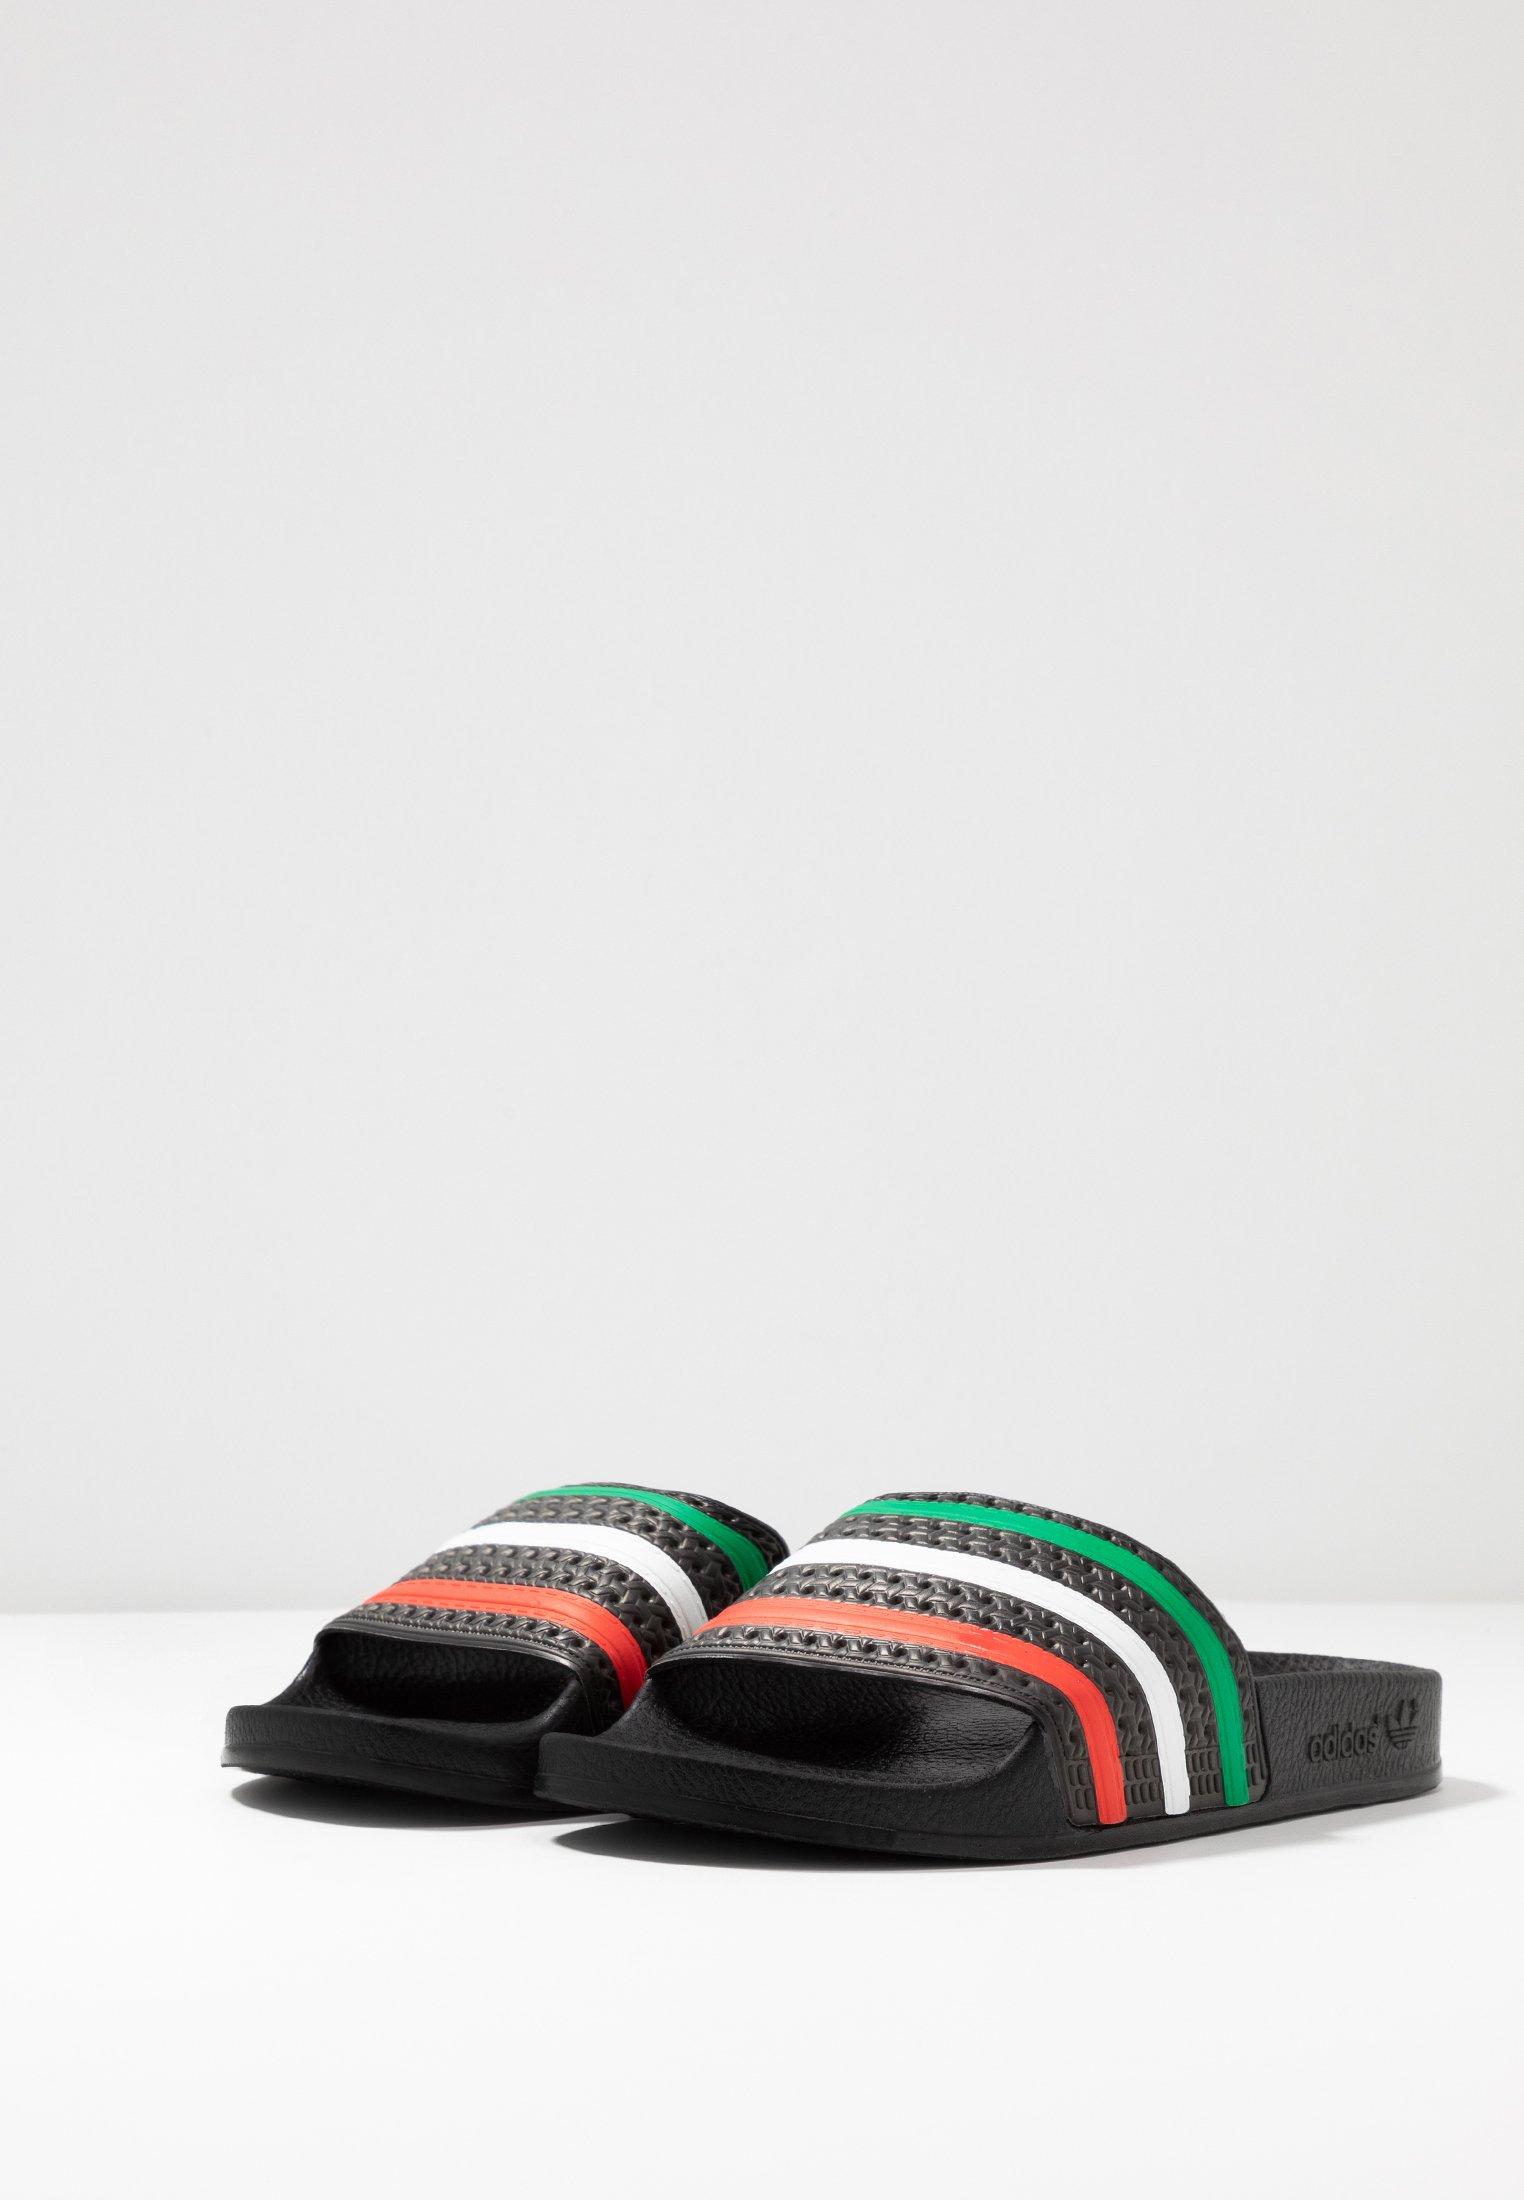 adidas Originals ADILETTE SLIP-ON-DESIGN SHOES - Badesandale - core black/red/footwear white - Black Friday